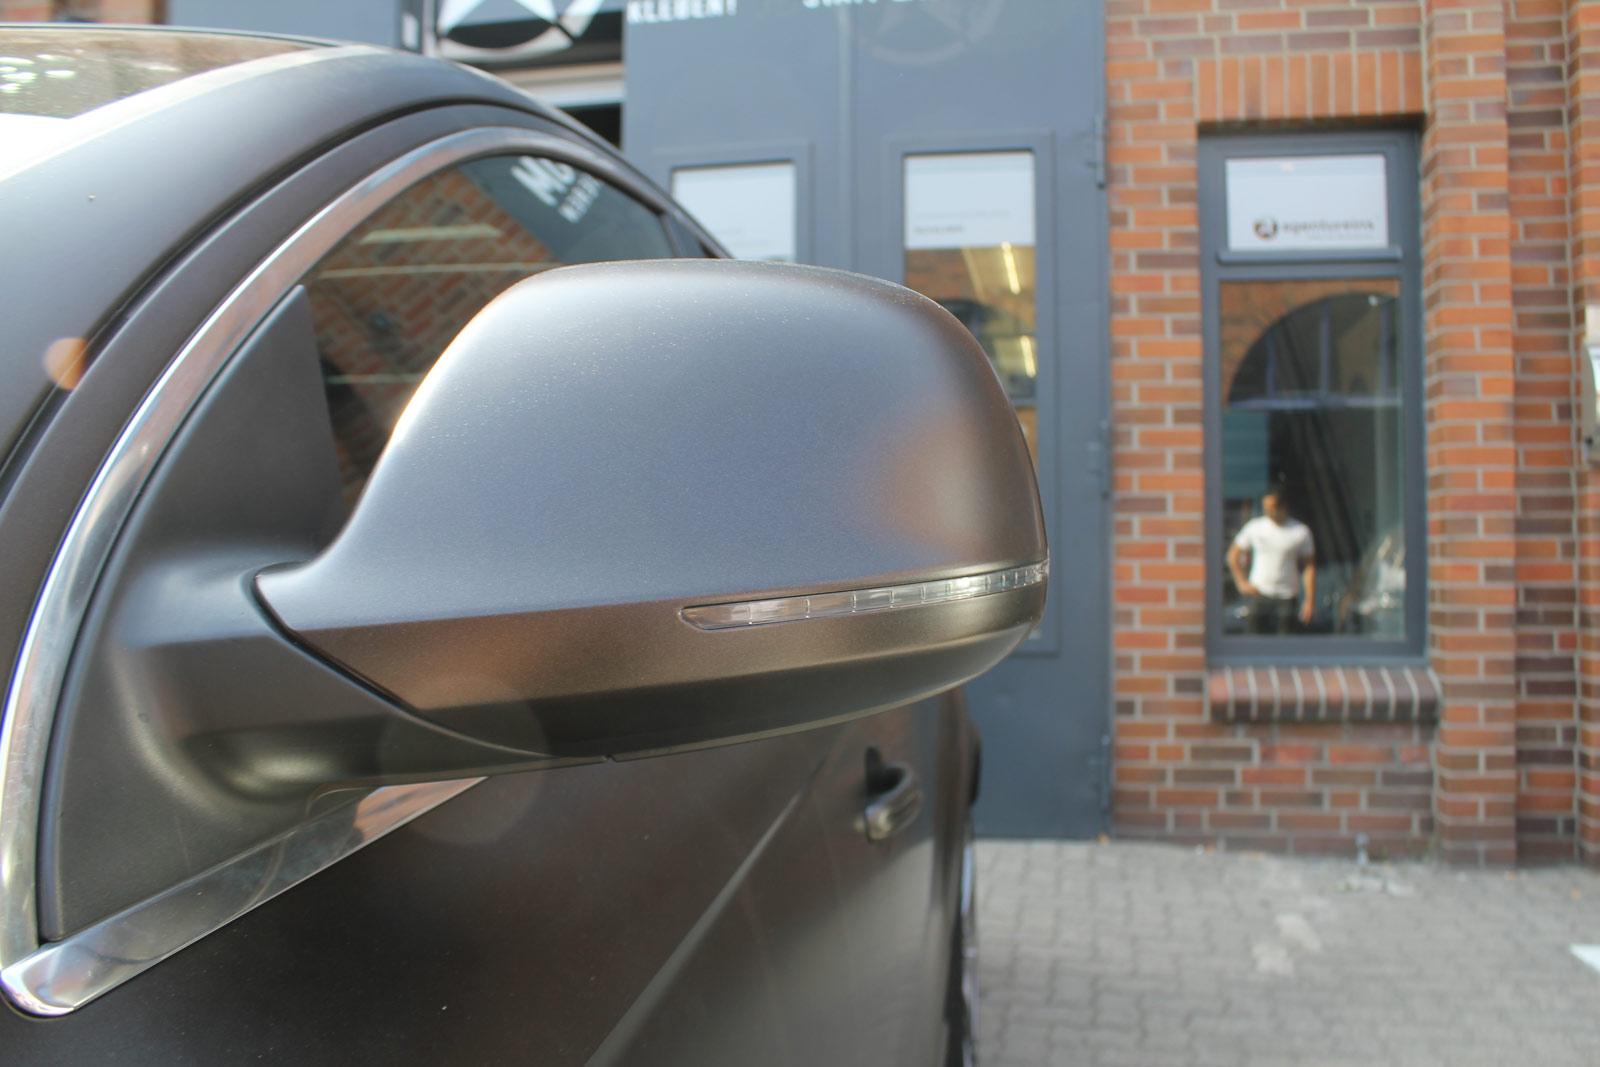 Audi_Q7_Folierung_Braun_Matt_Metallic_04